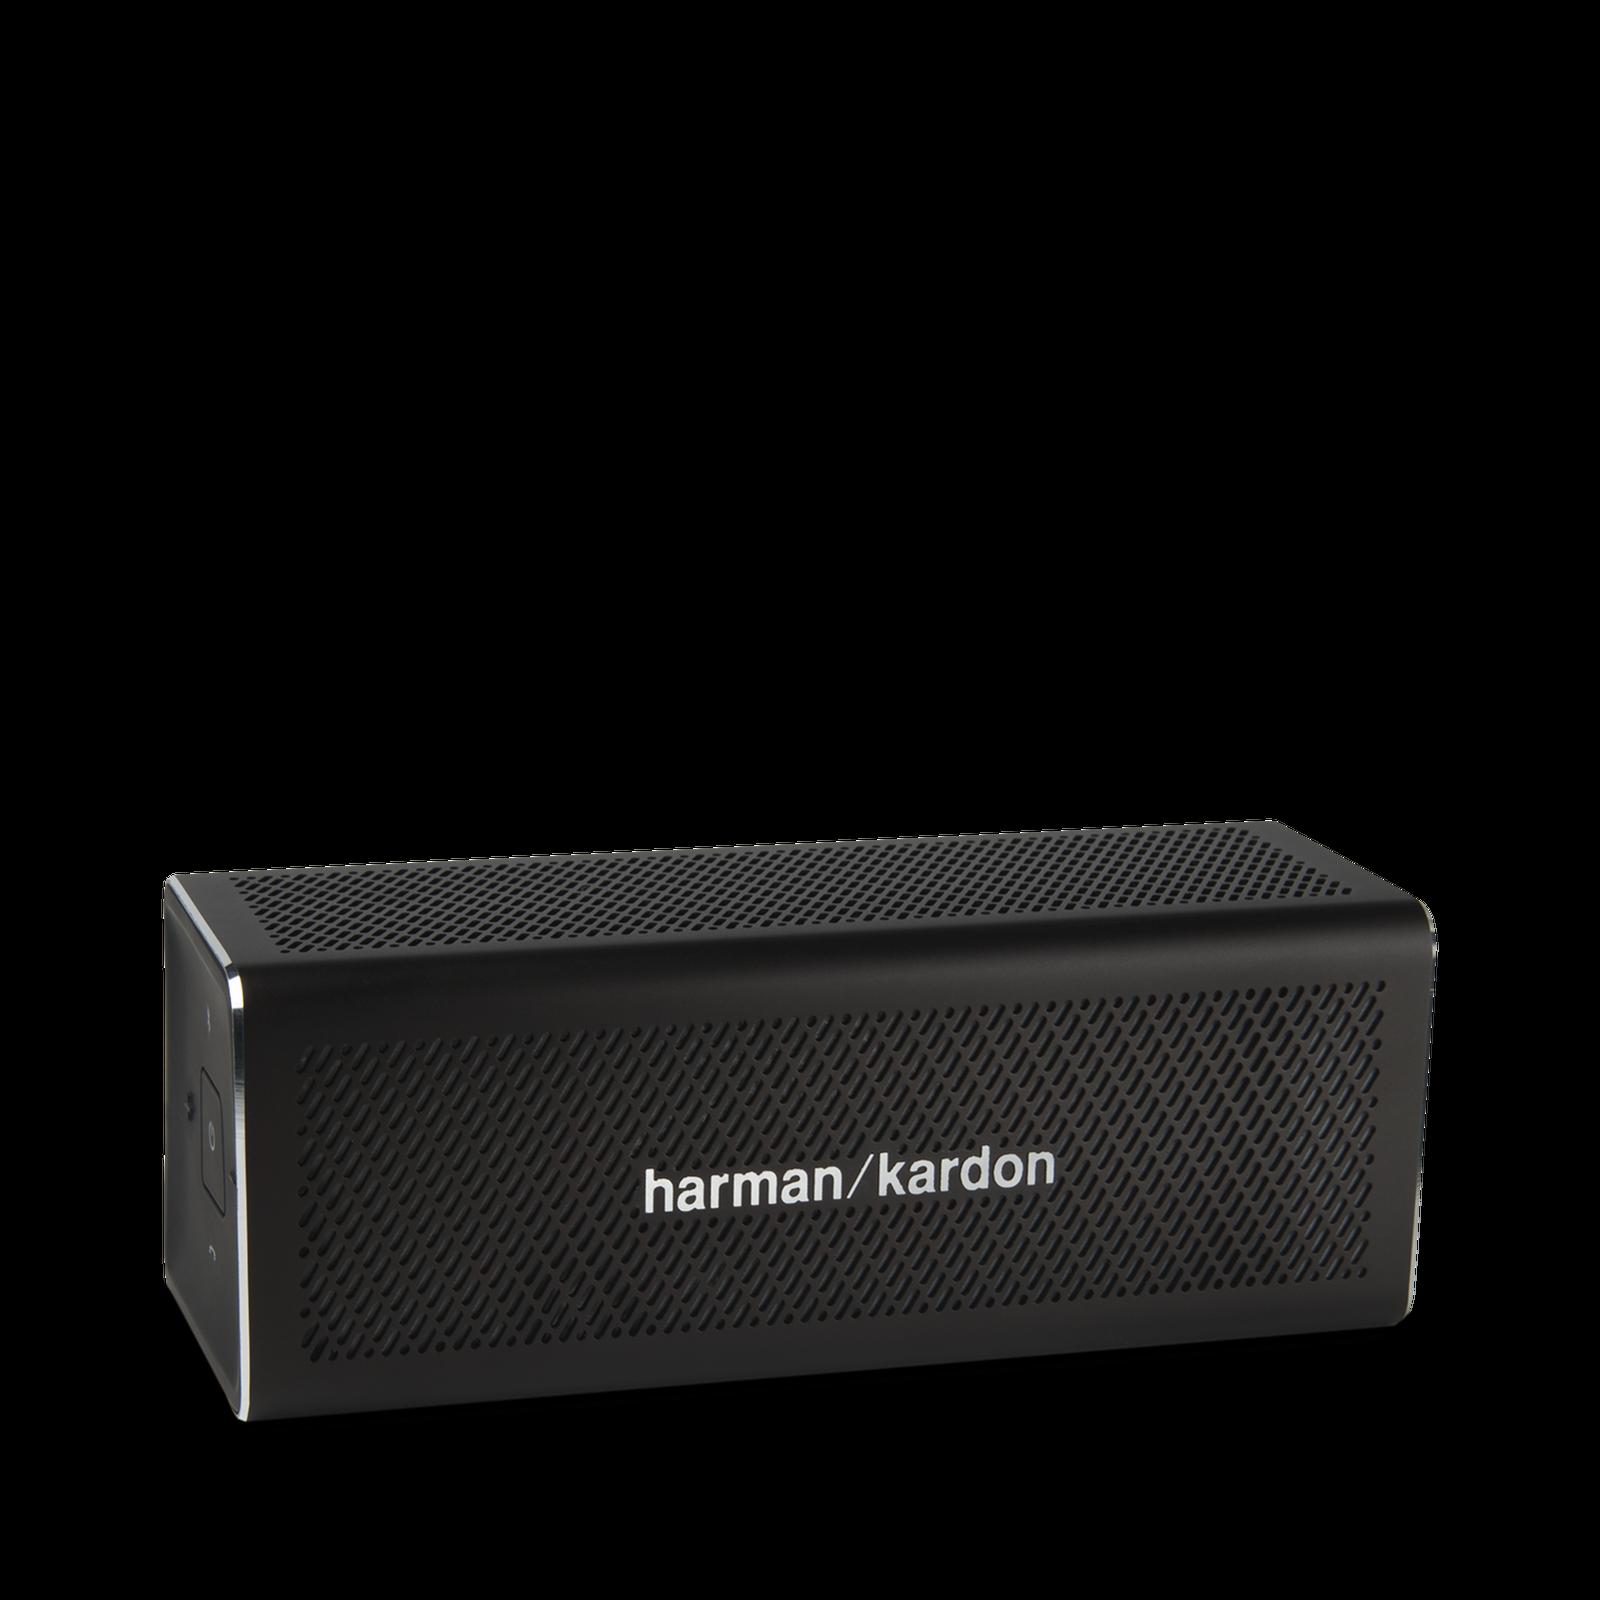 harman-kardon-hk-one-portable-bluetooth-speaker